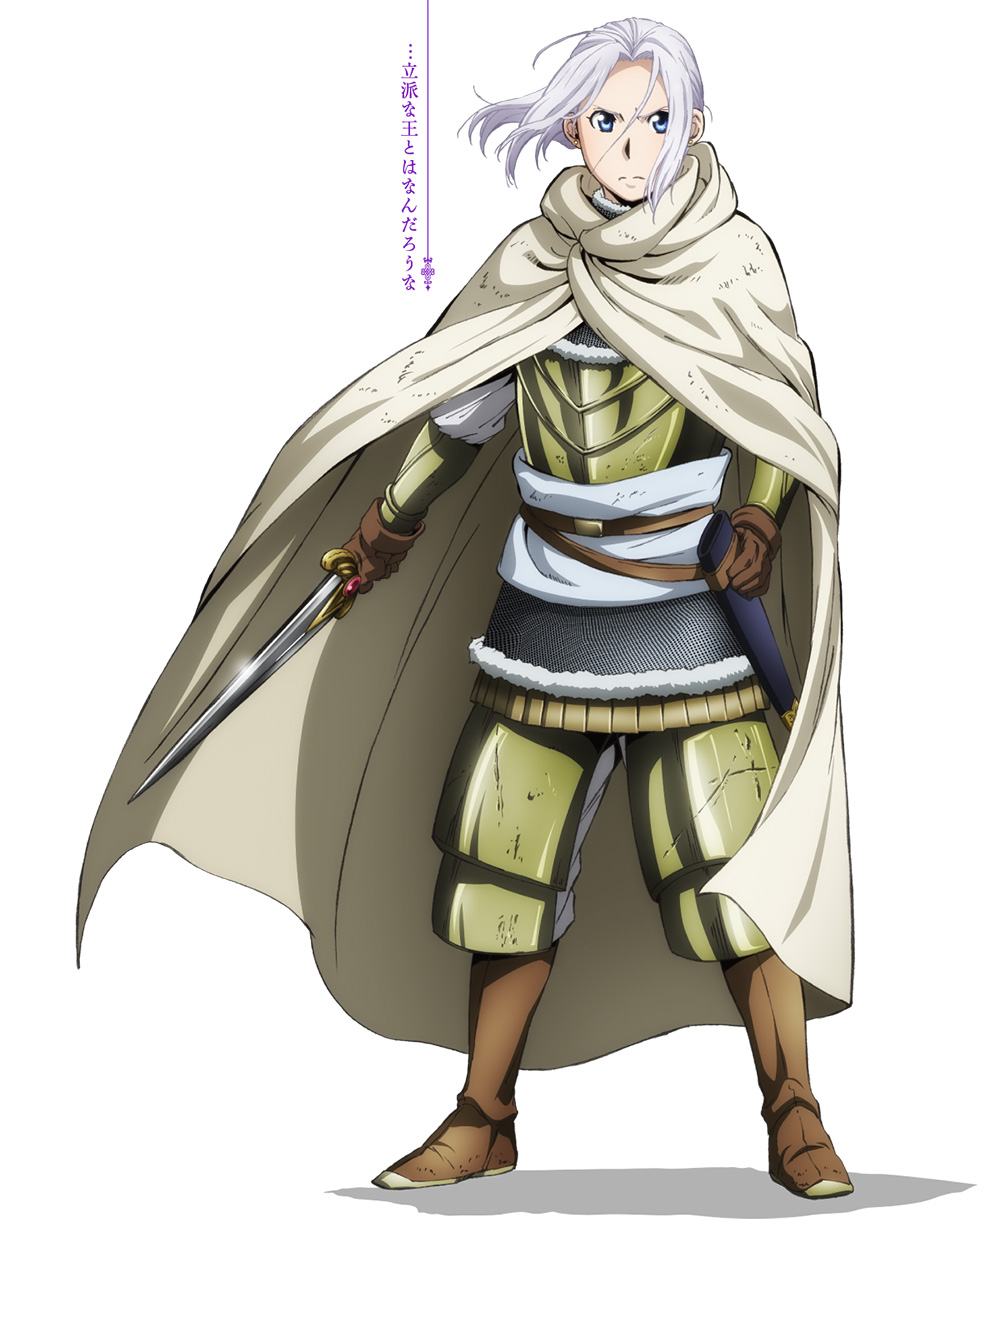 Arslan-Senki-Anime-Character-Visual-Arslan